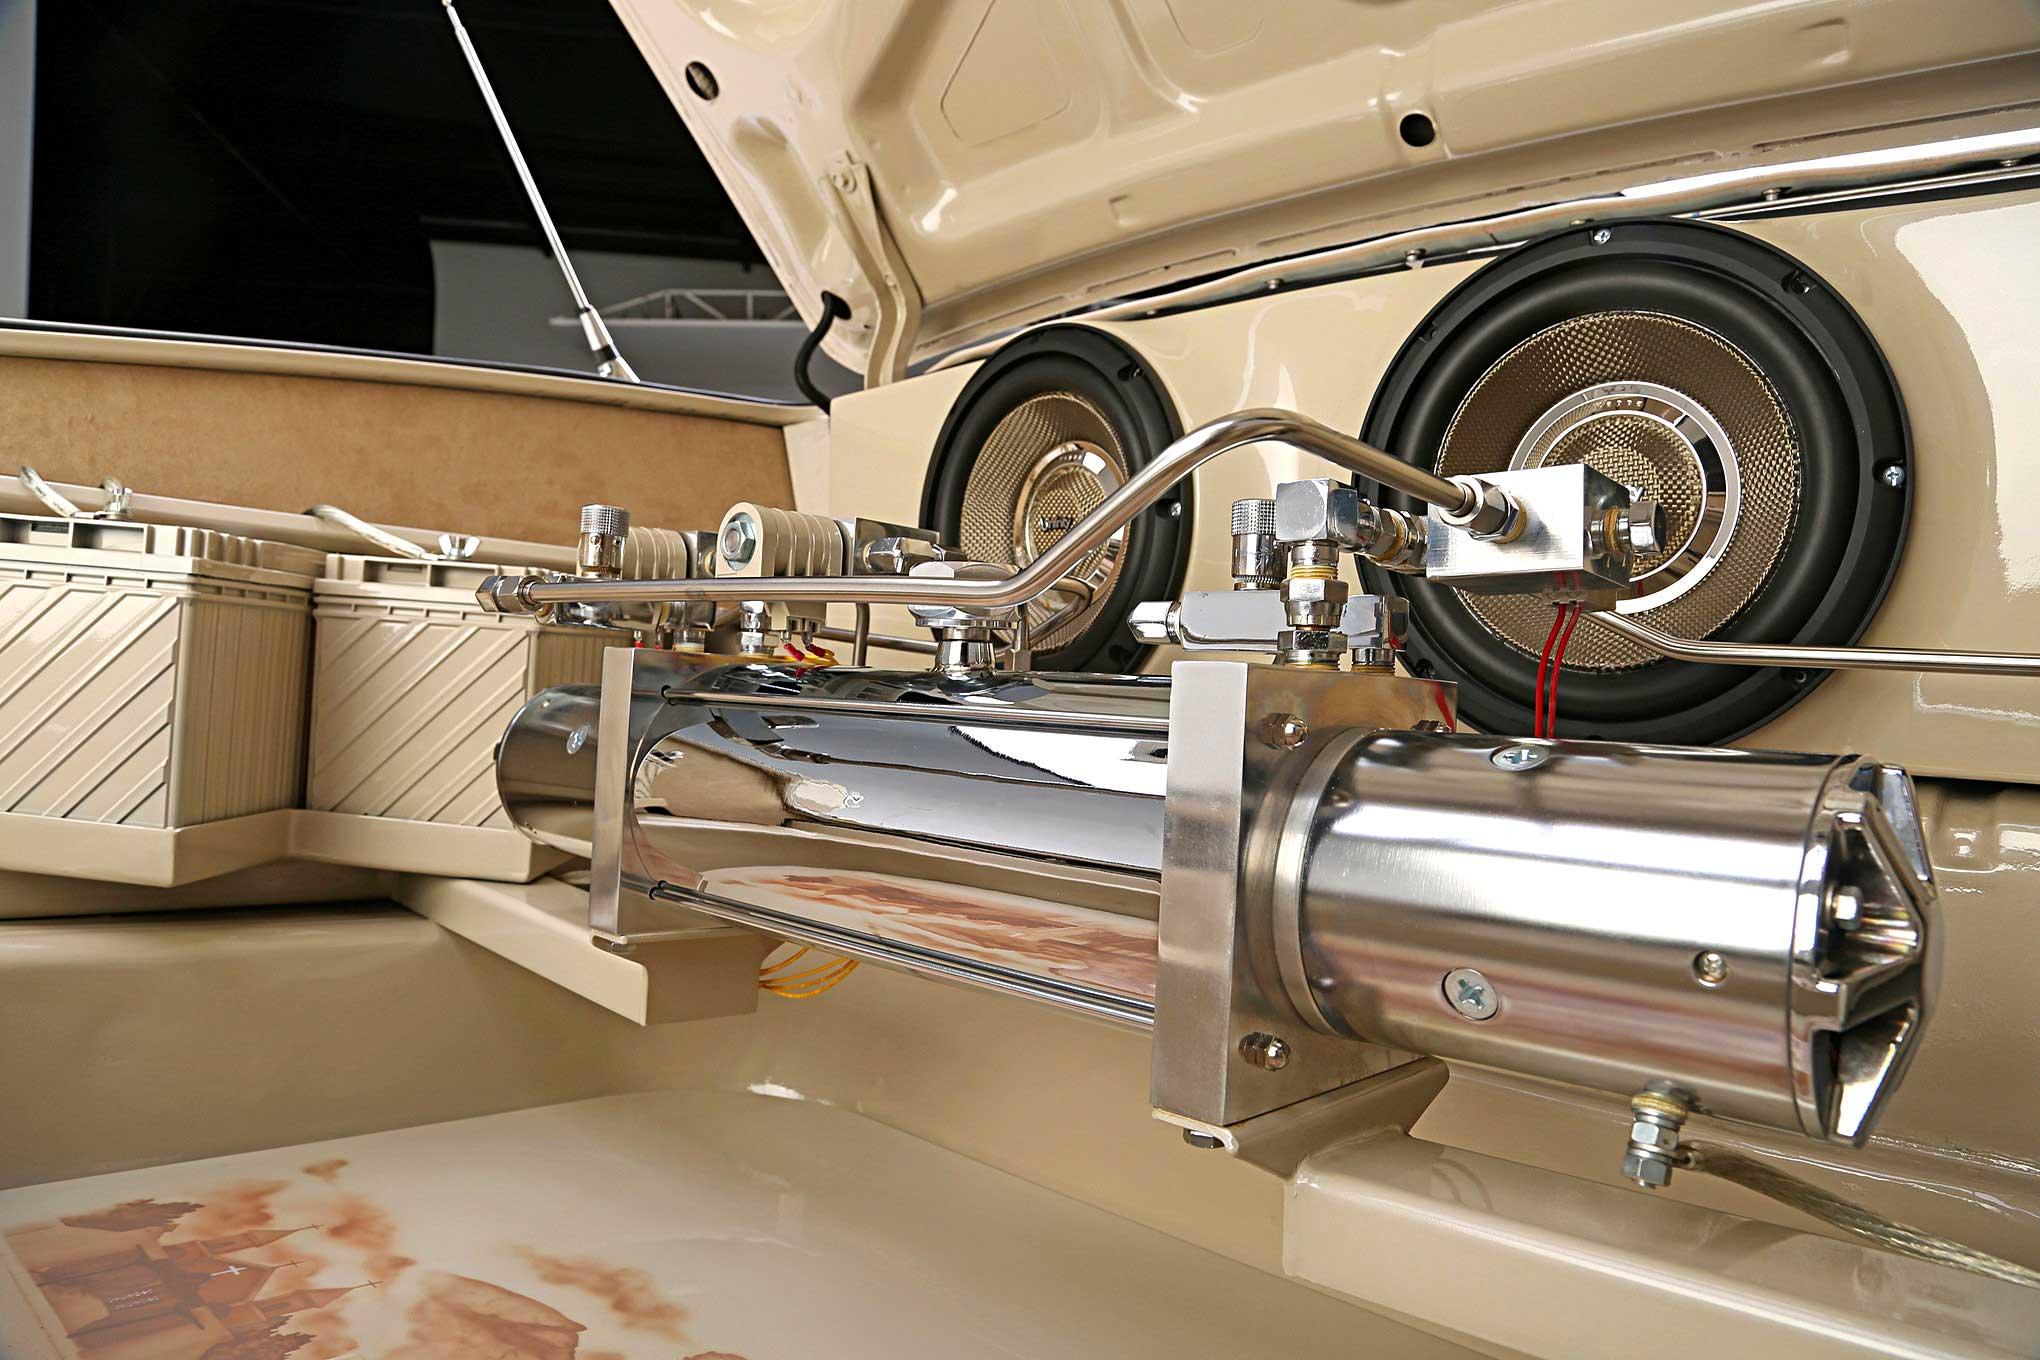 1964 Chevy Impala - Boulevard LegendLowrider